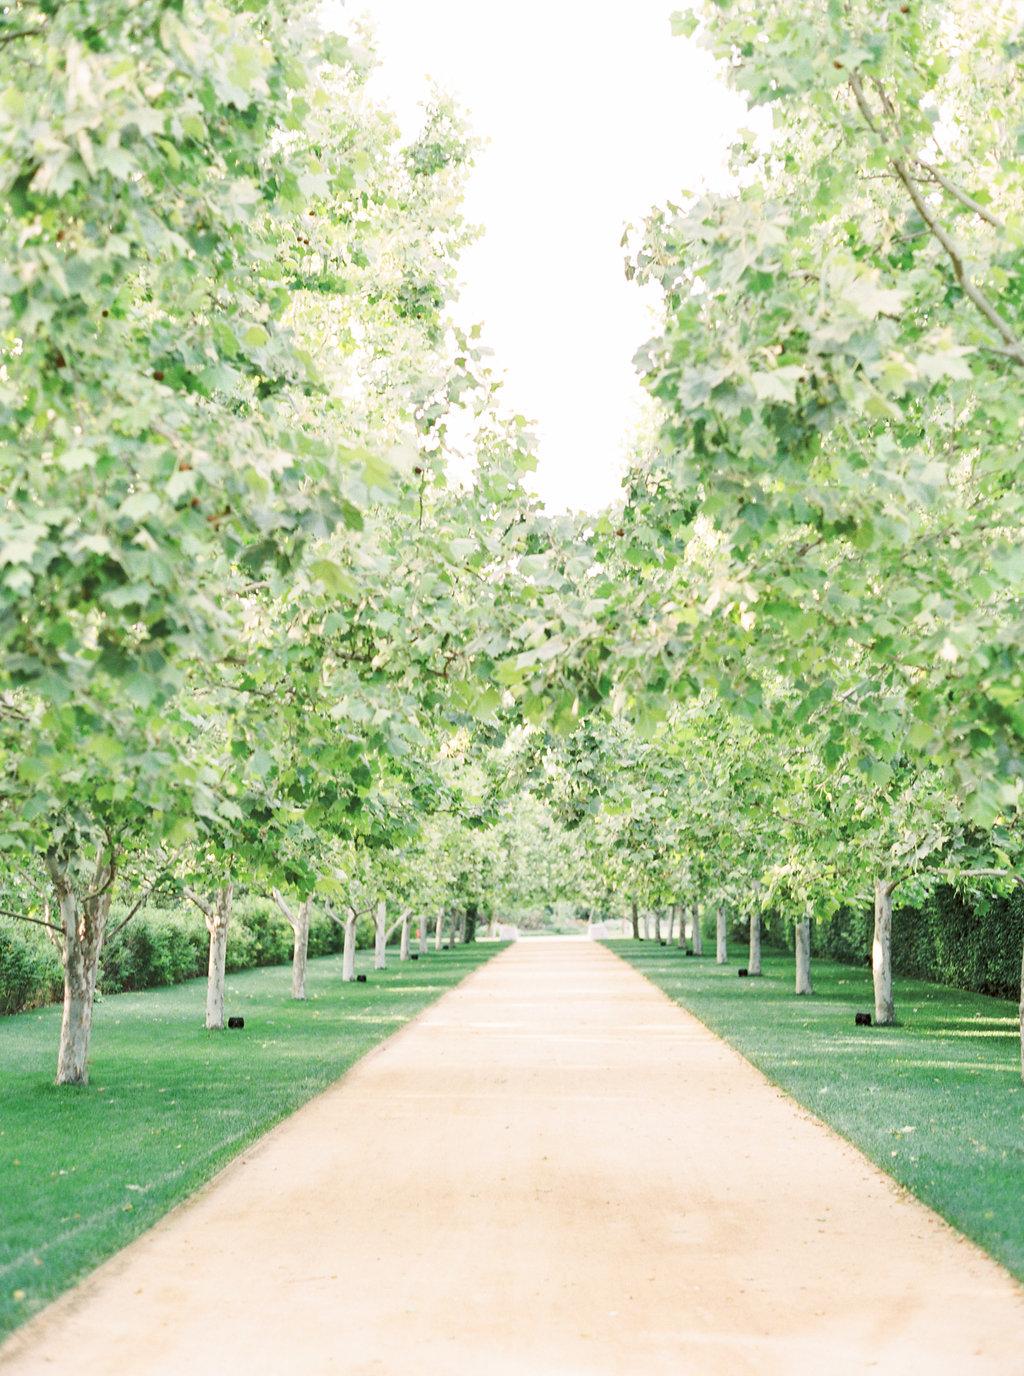 alegria-by-design-wedding-planner-planning-event-design-santa-barbara-day-of-coordinator-kestrel-park-santa-ynez-fields-castle-lavender-garden-mrs-box (38).jpg